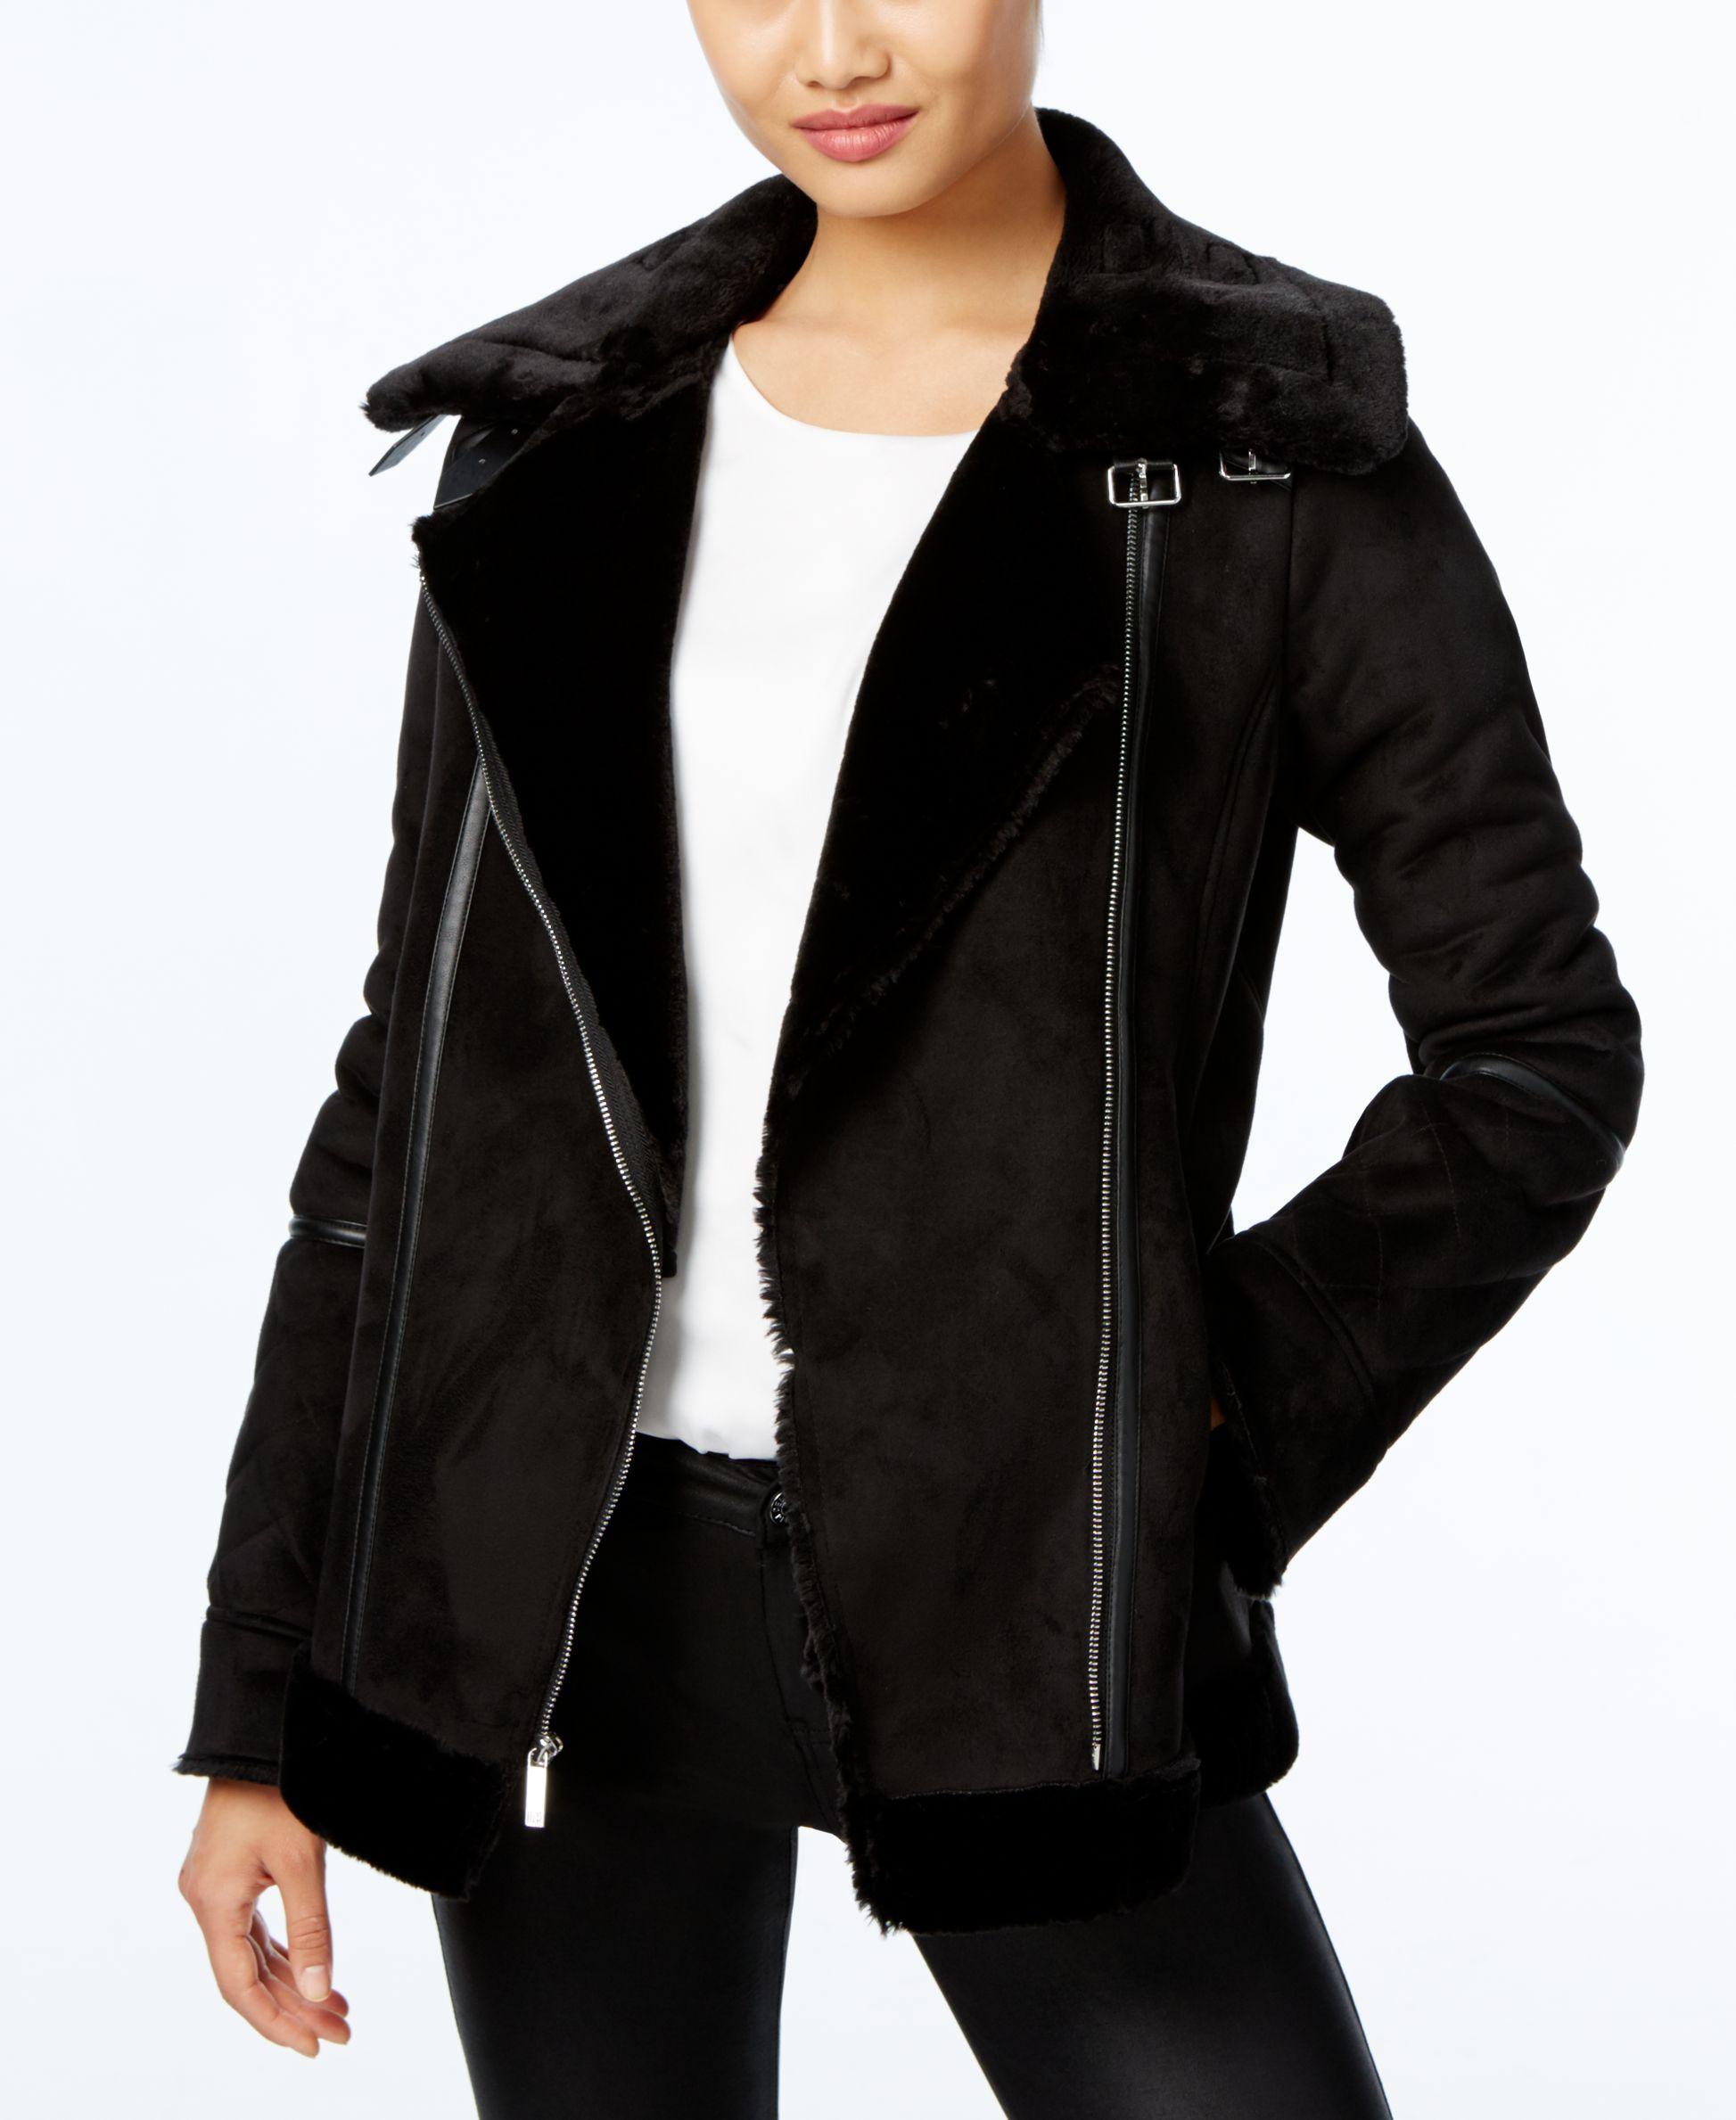 Laundry By Design Faux Shearling Moto Coat Moto Coat Black Coat Coats For Women